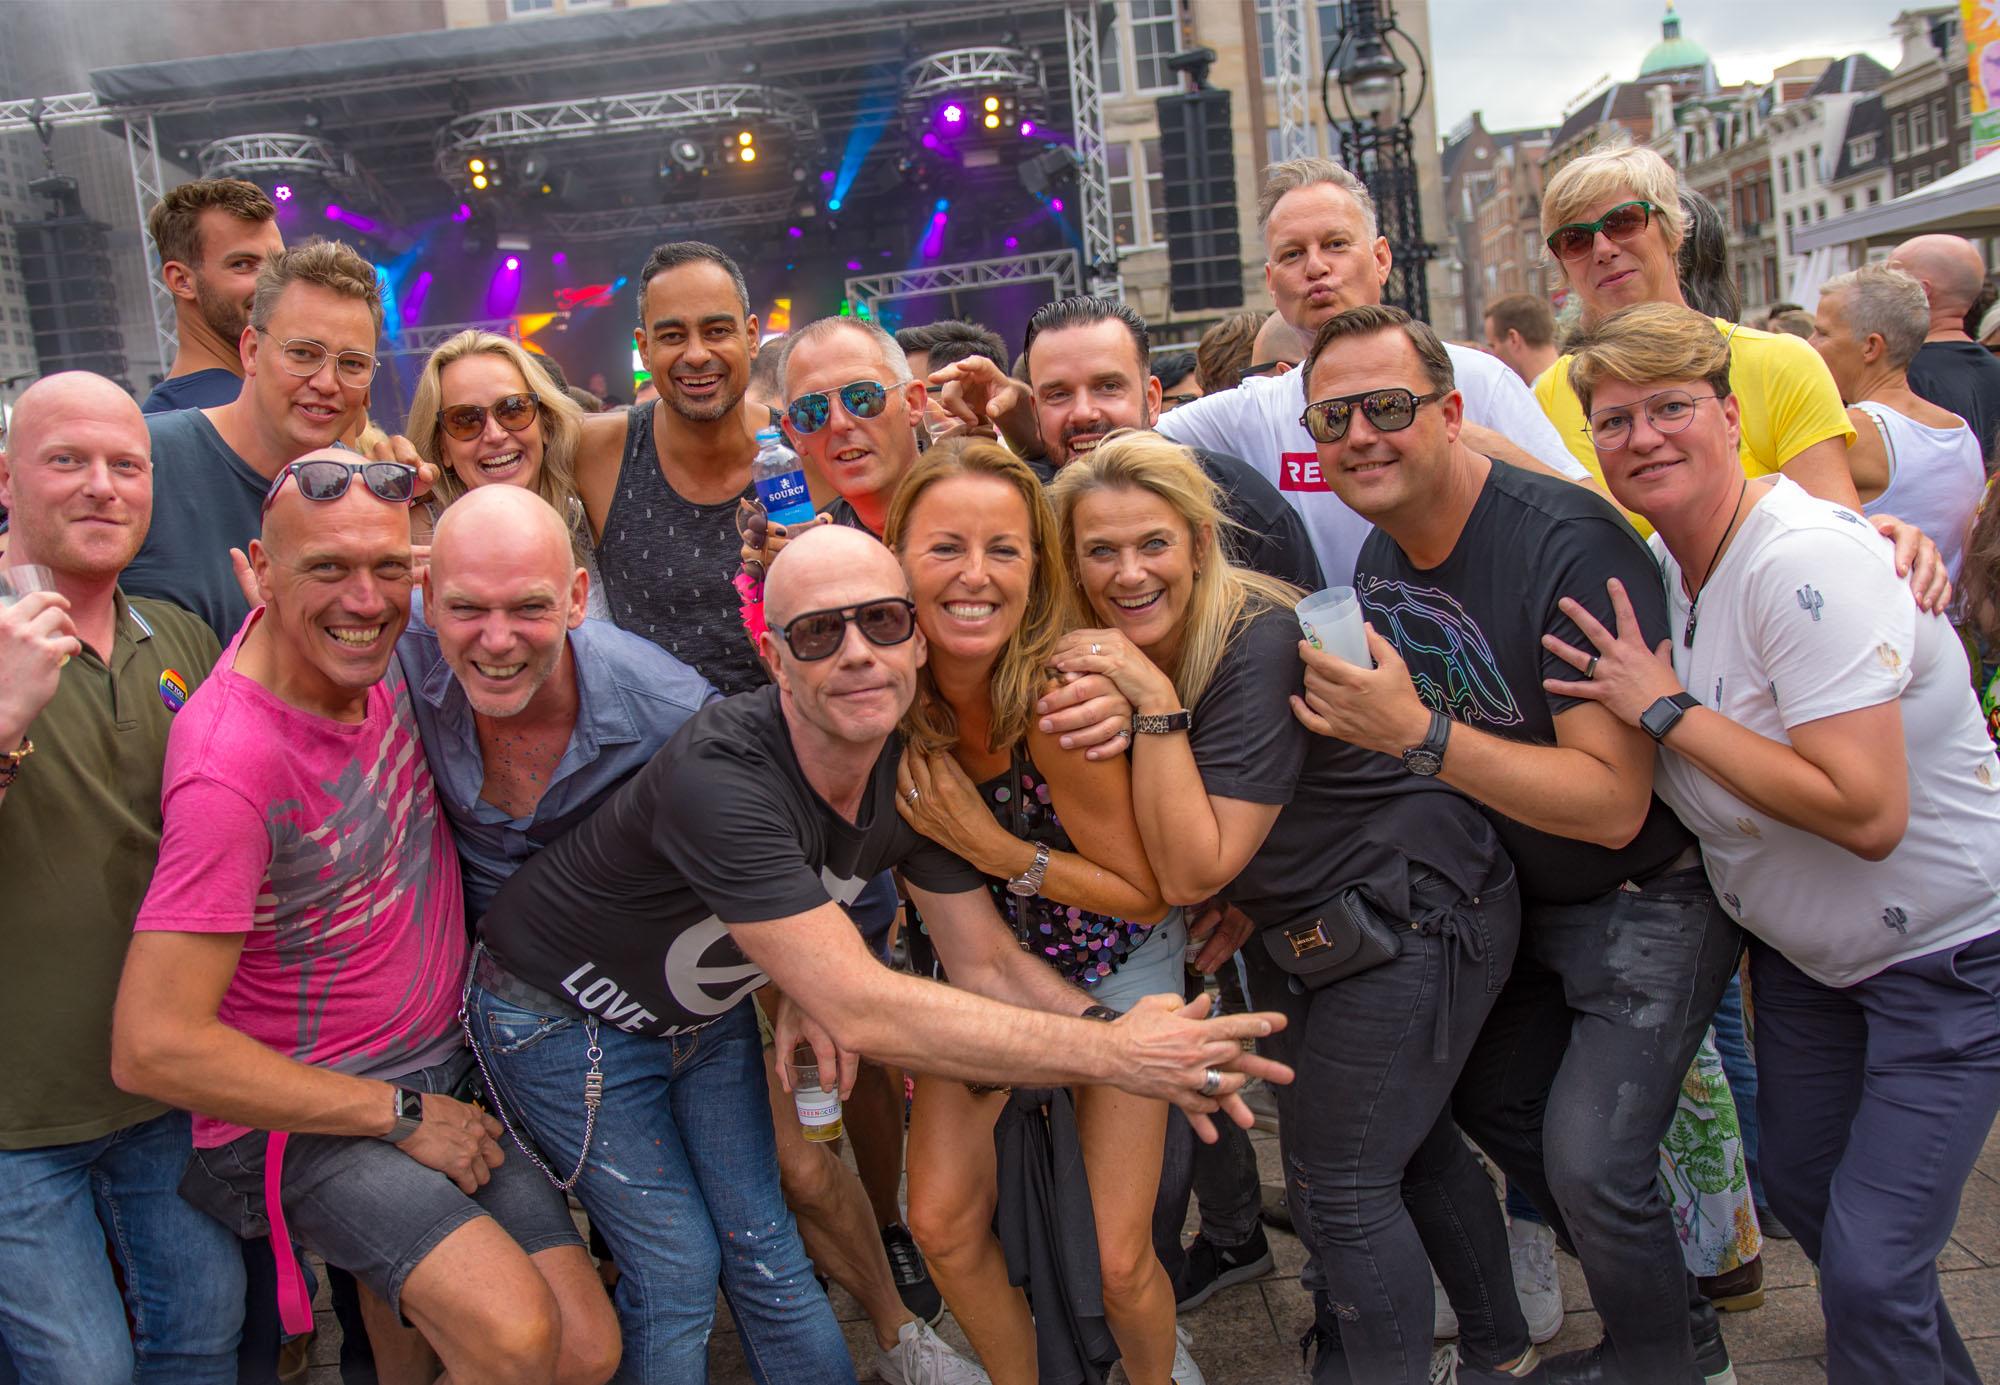 Amsterdam-Pride-03-08-2019-_0019_Hinterg